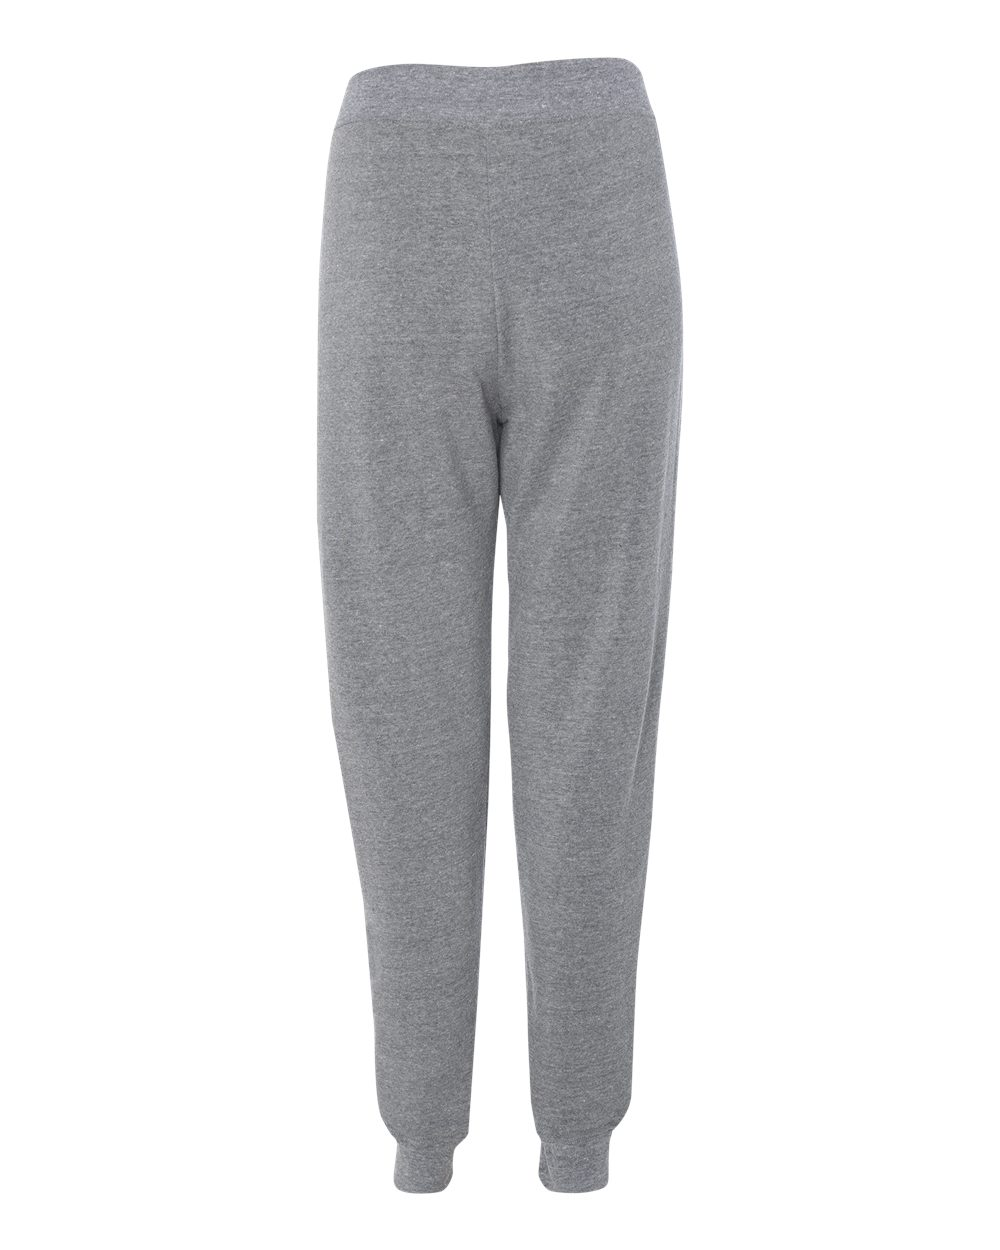 Alternative-Mens-Eco-Fleece-Dodgeball-Pants-Sweatpants-Pocket-9881-up-to-2XL thumbnail 10